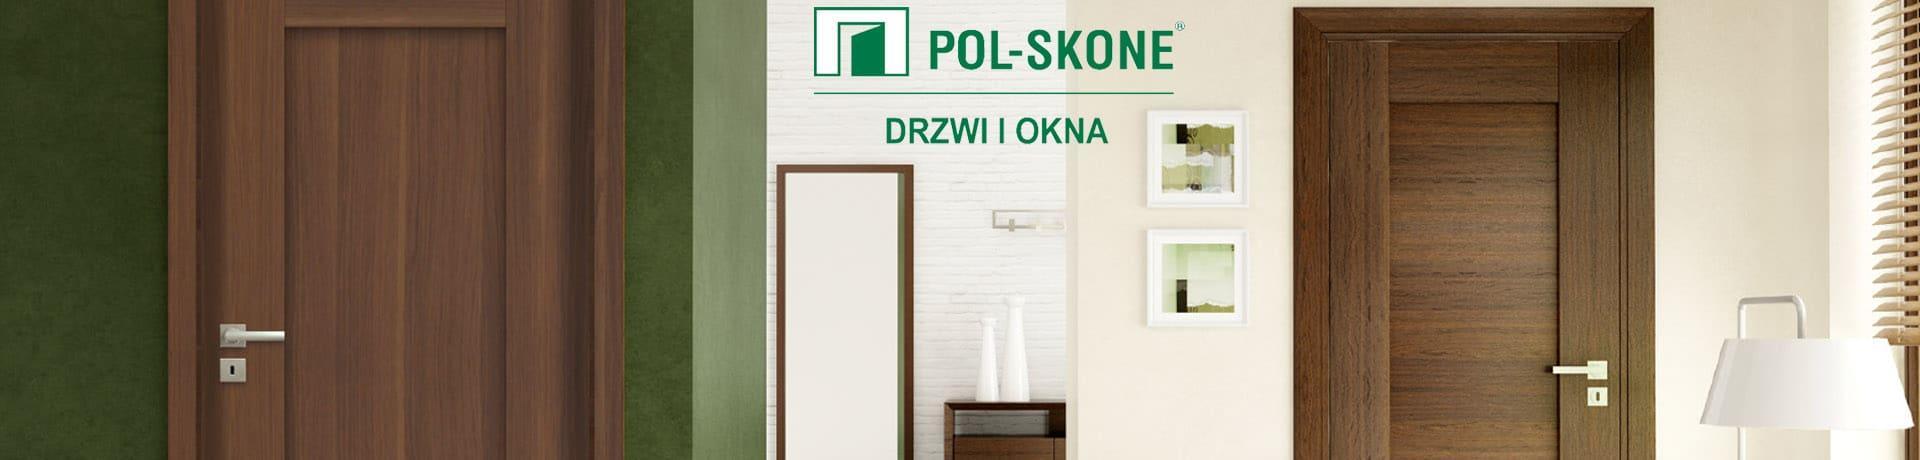 Drzwi POL-SKONE baner